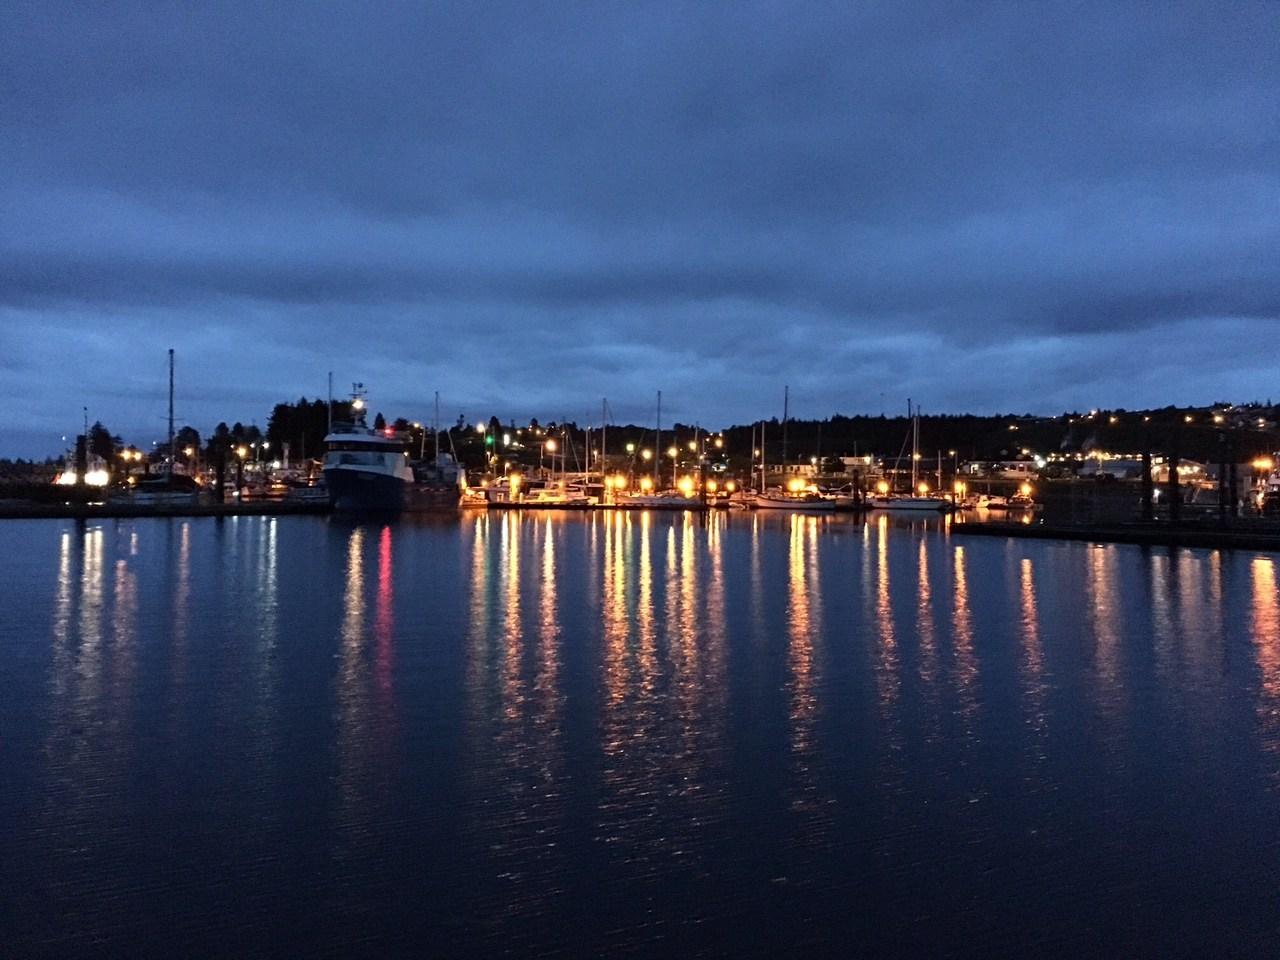 Port McNeill at 5am